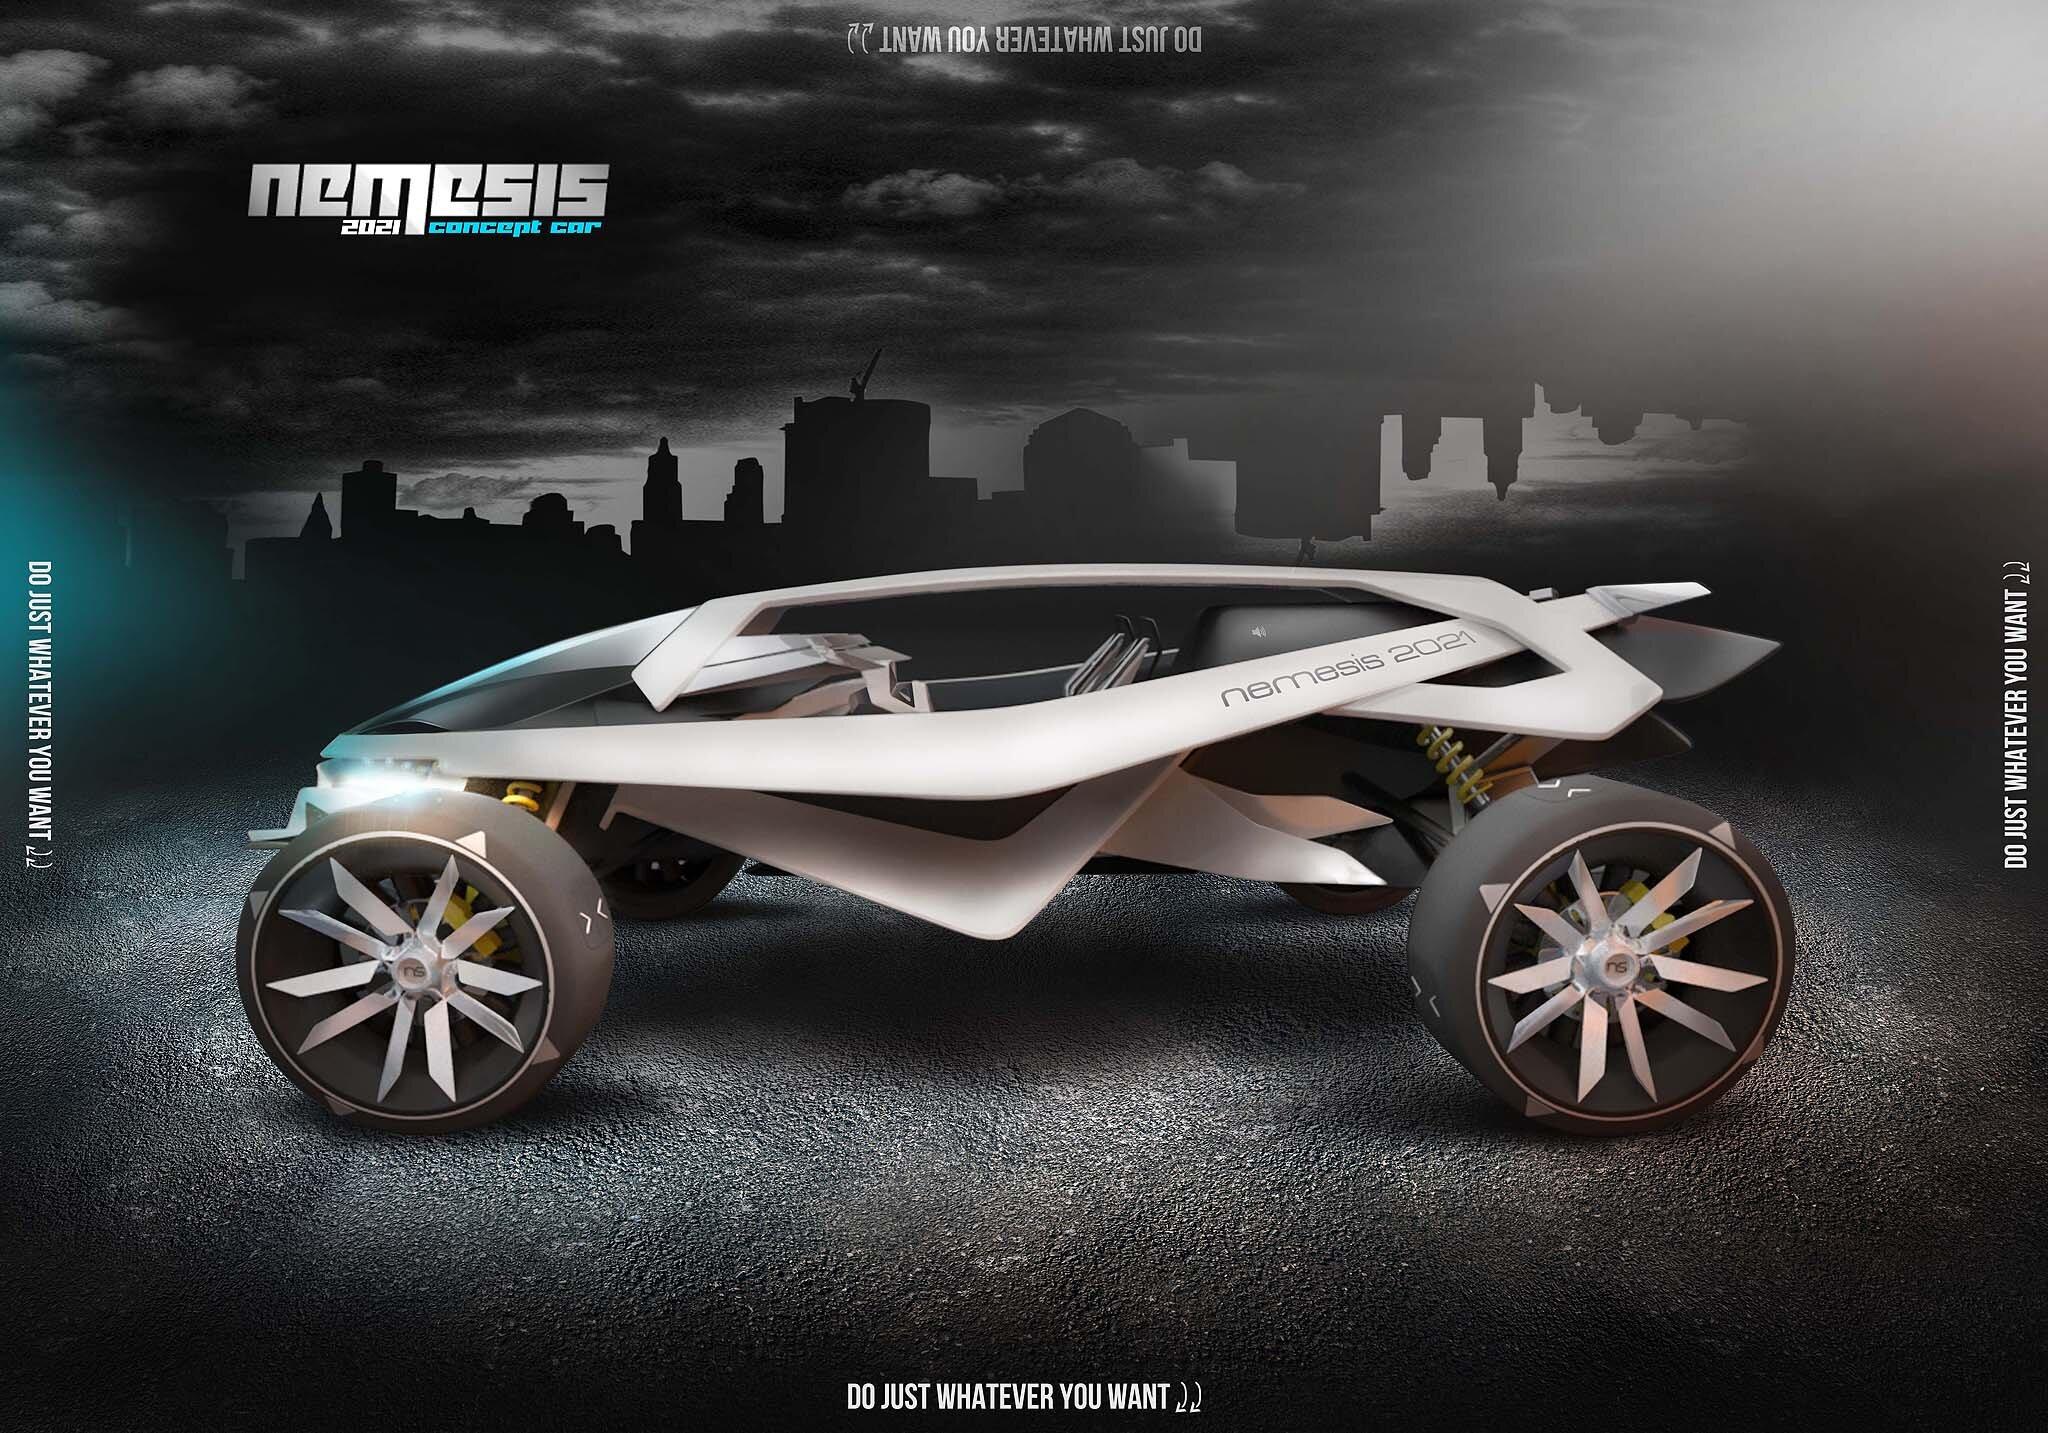 Nemesis_concept_car_final_01_source.jpg